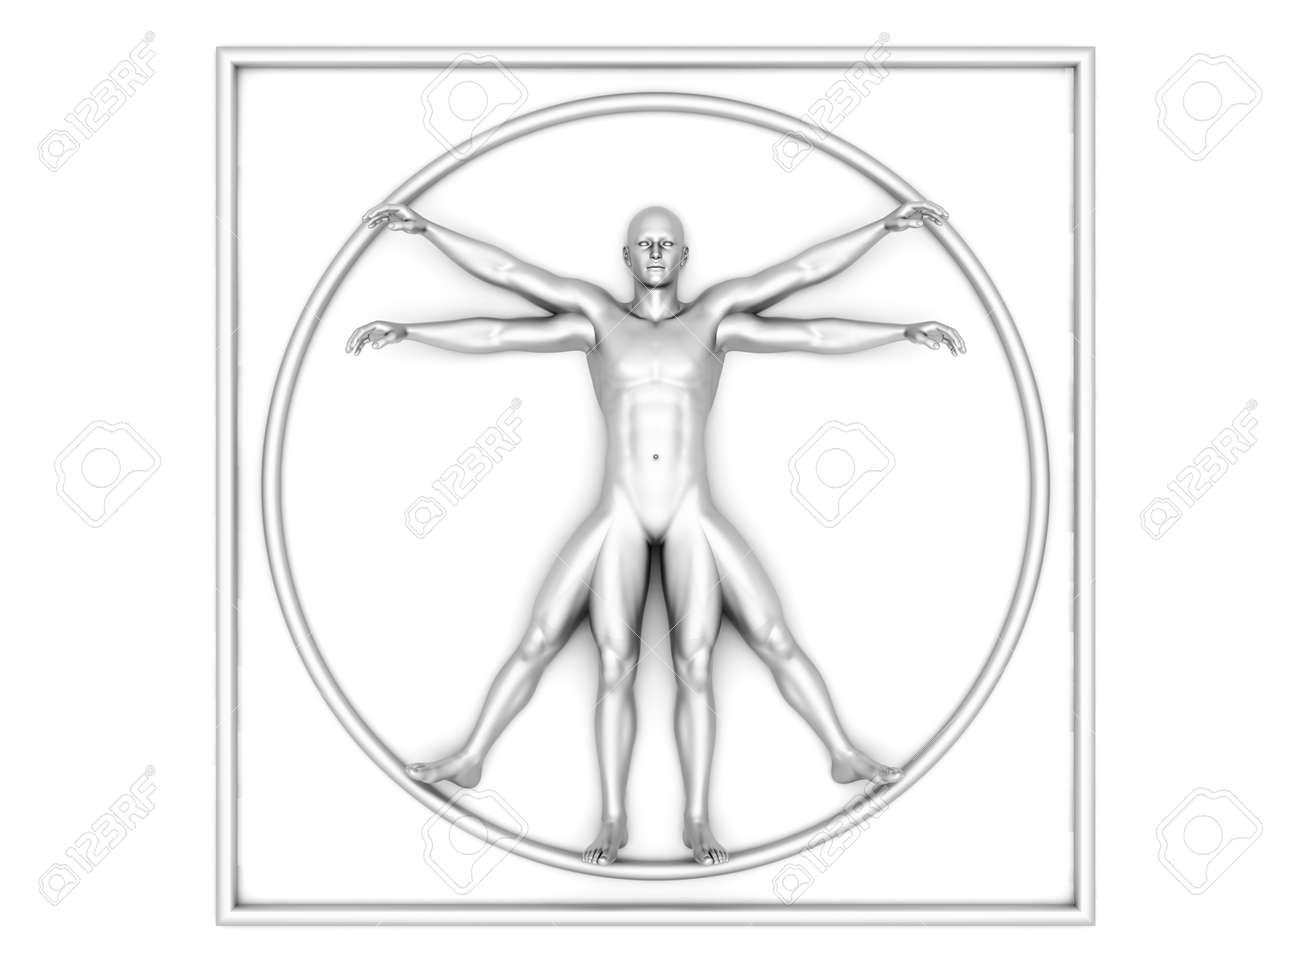 3D Gerendert Interpretation Des Berühmten Leonardo Da Vinci-Skizze ...